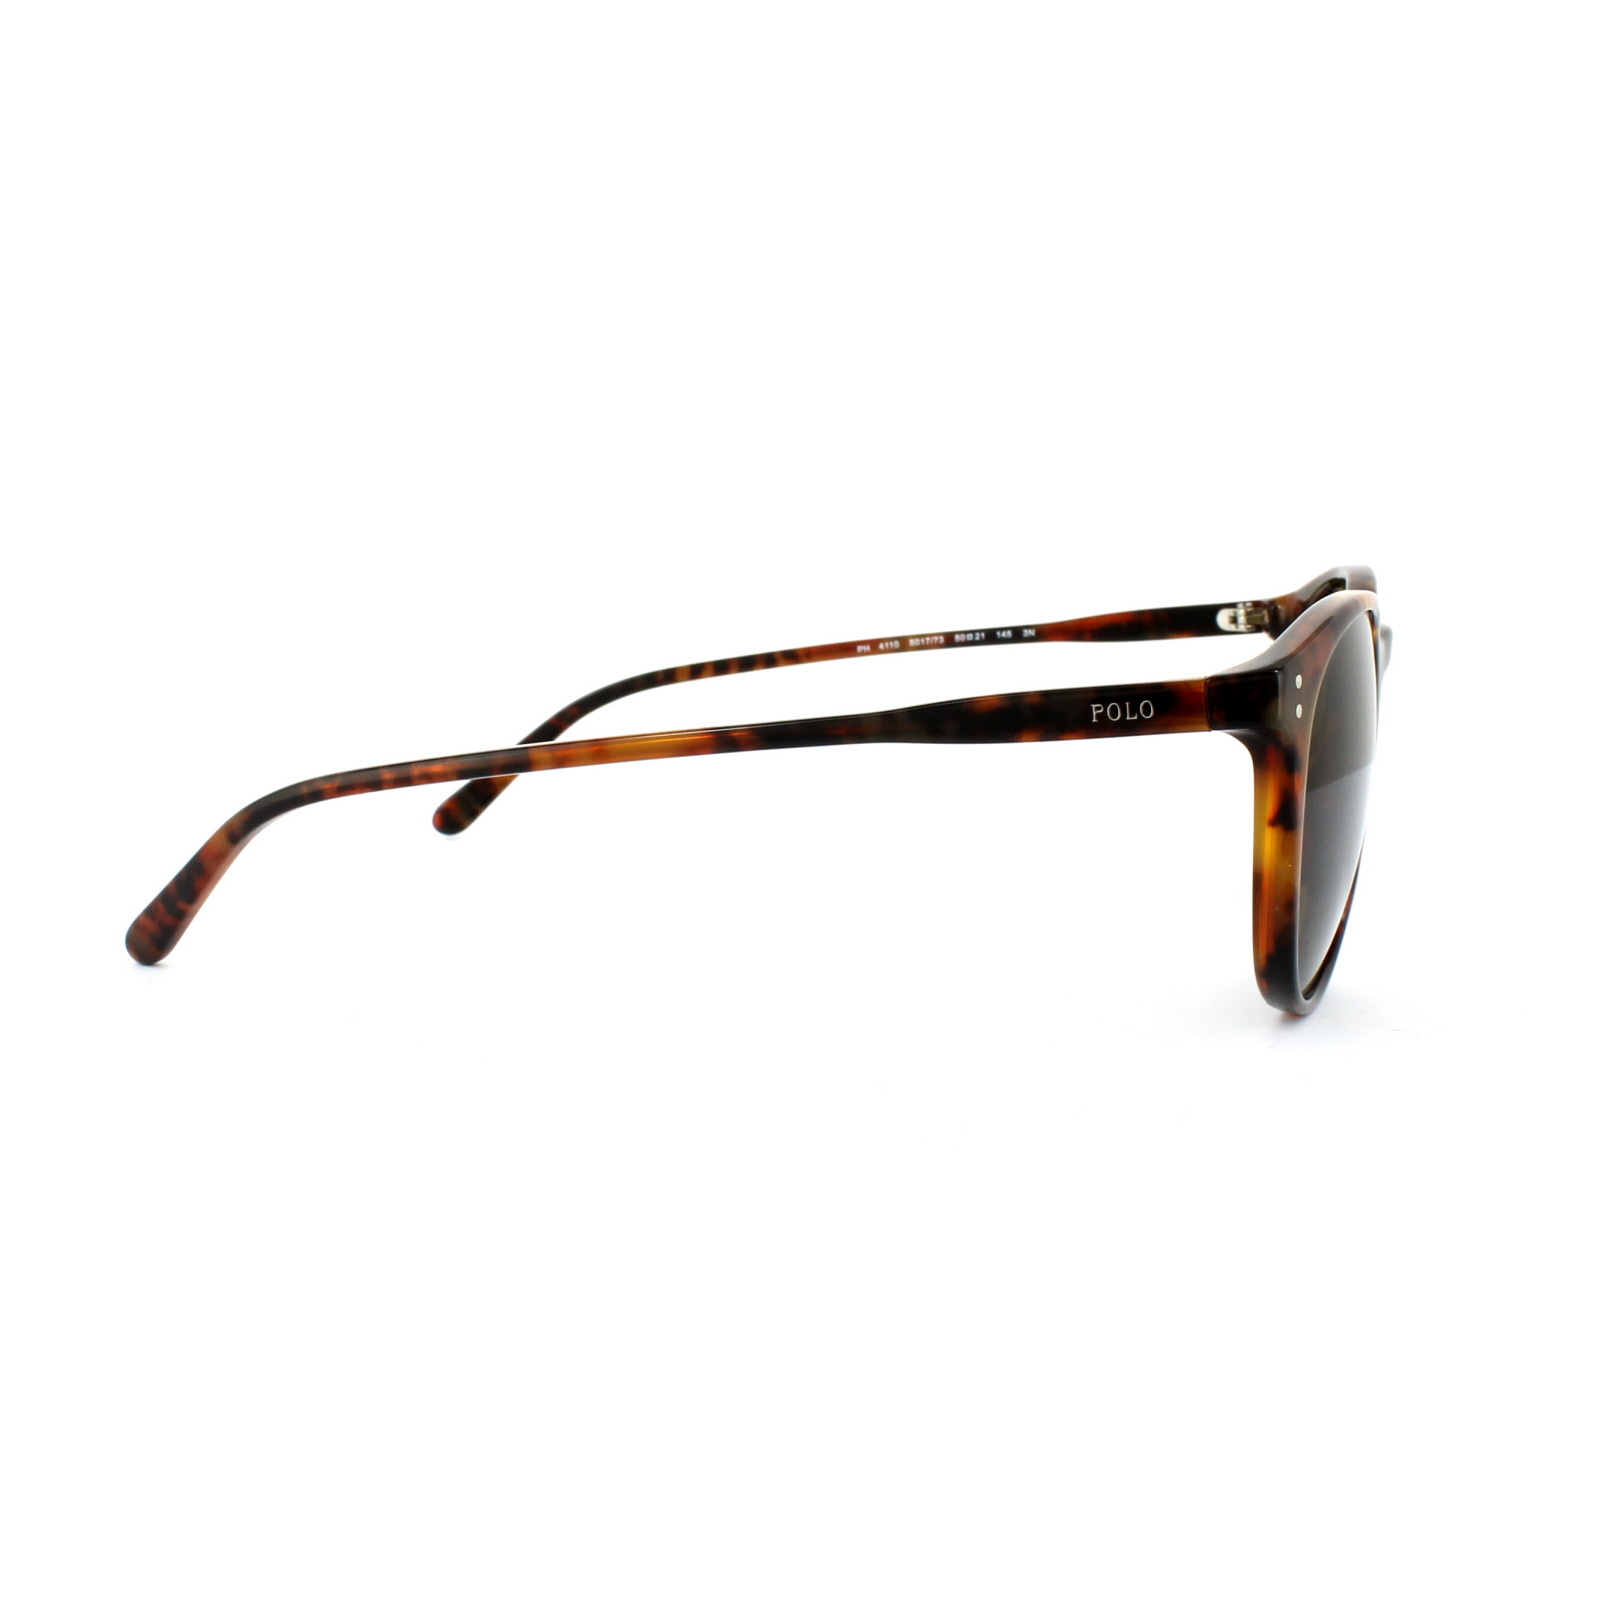 Polo Ralph Lauren Sunglasses 4110 501773 Havana Brown 8053672557848 ... 34780b5a2e7b